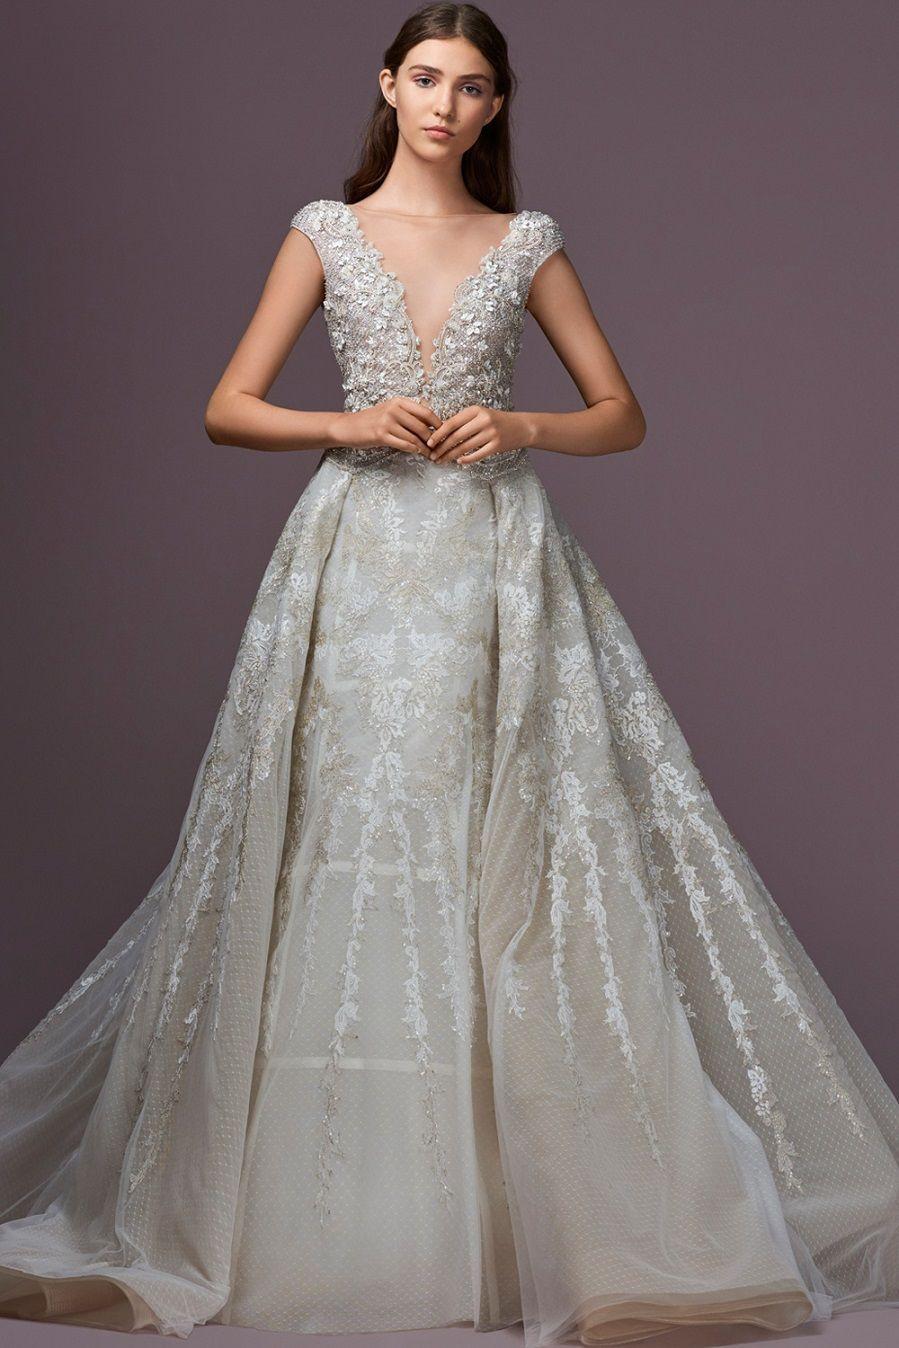 57 Stunning Wedding Dresses With Detachable Skirts 2nd